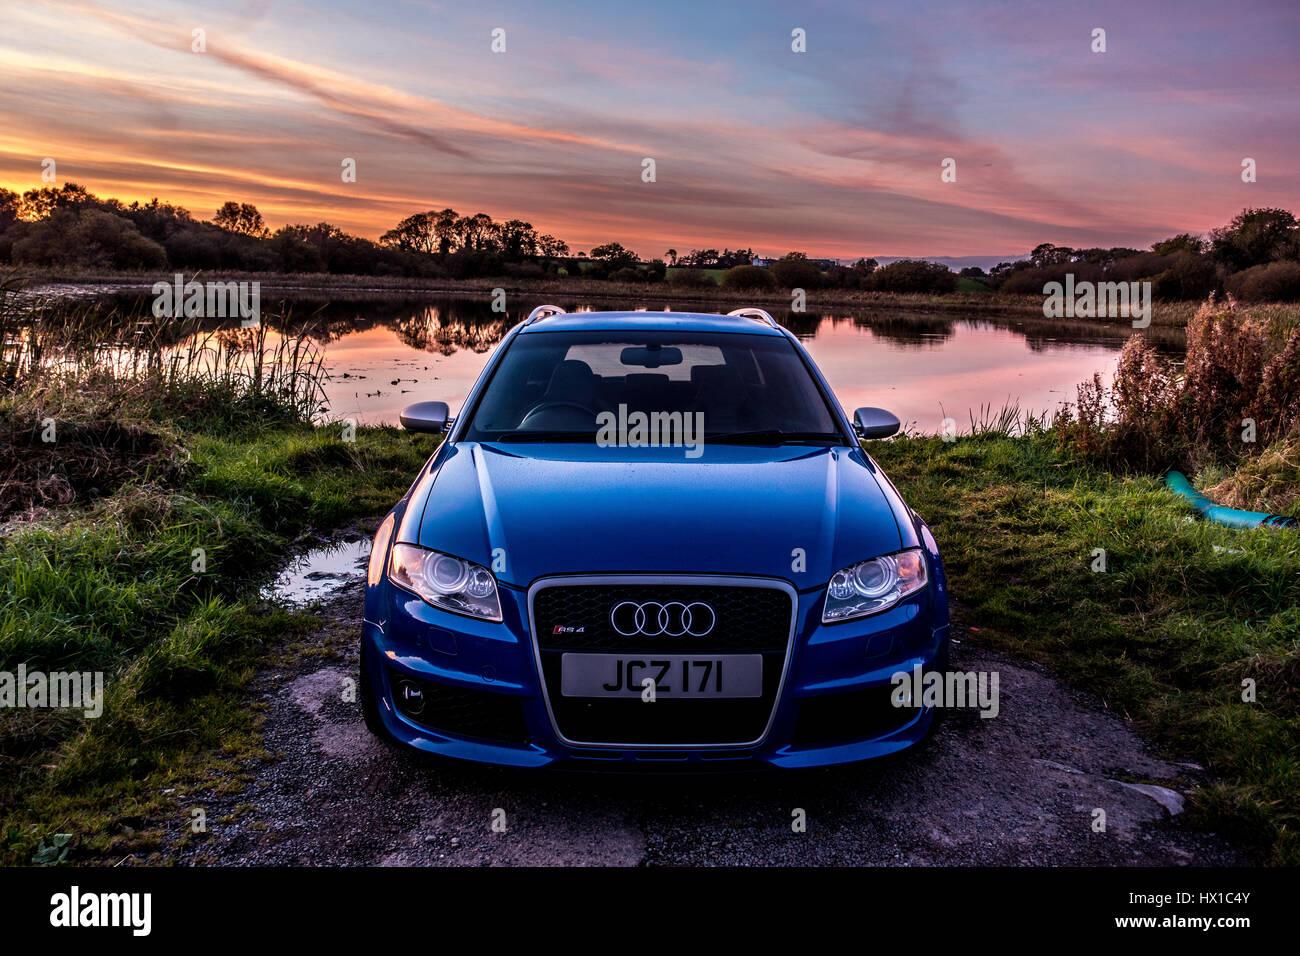 Audi RS4 Sprint Blue Avant - Stock Image